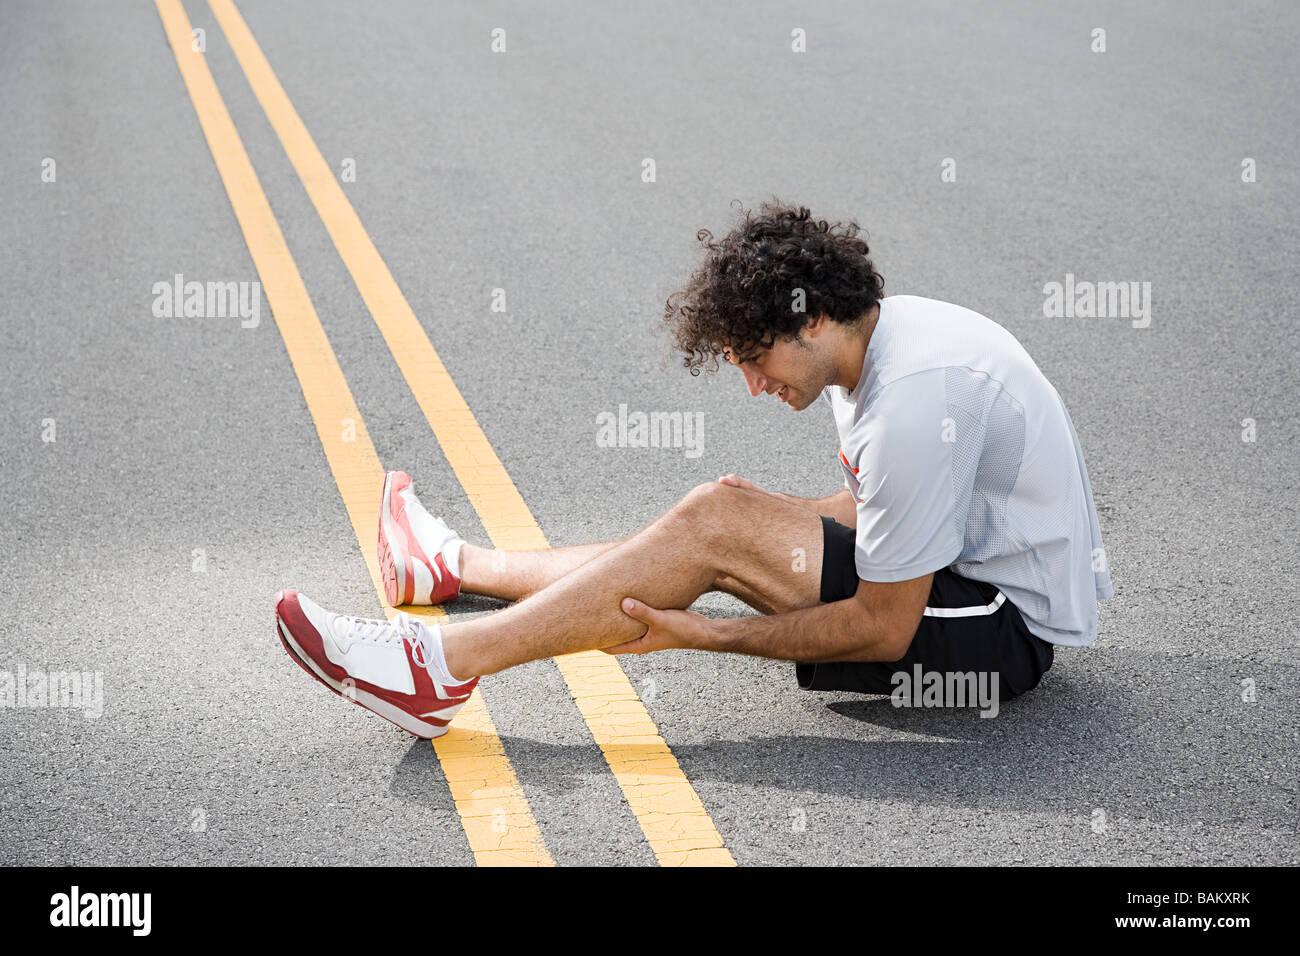 Runner with injured leg - Stock Image